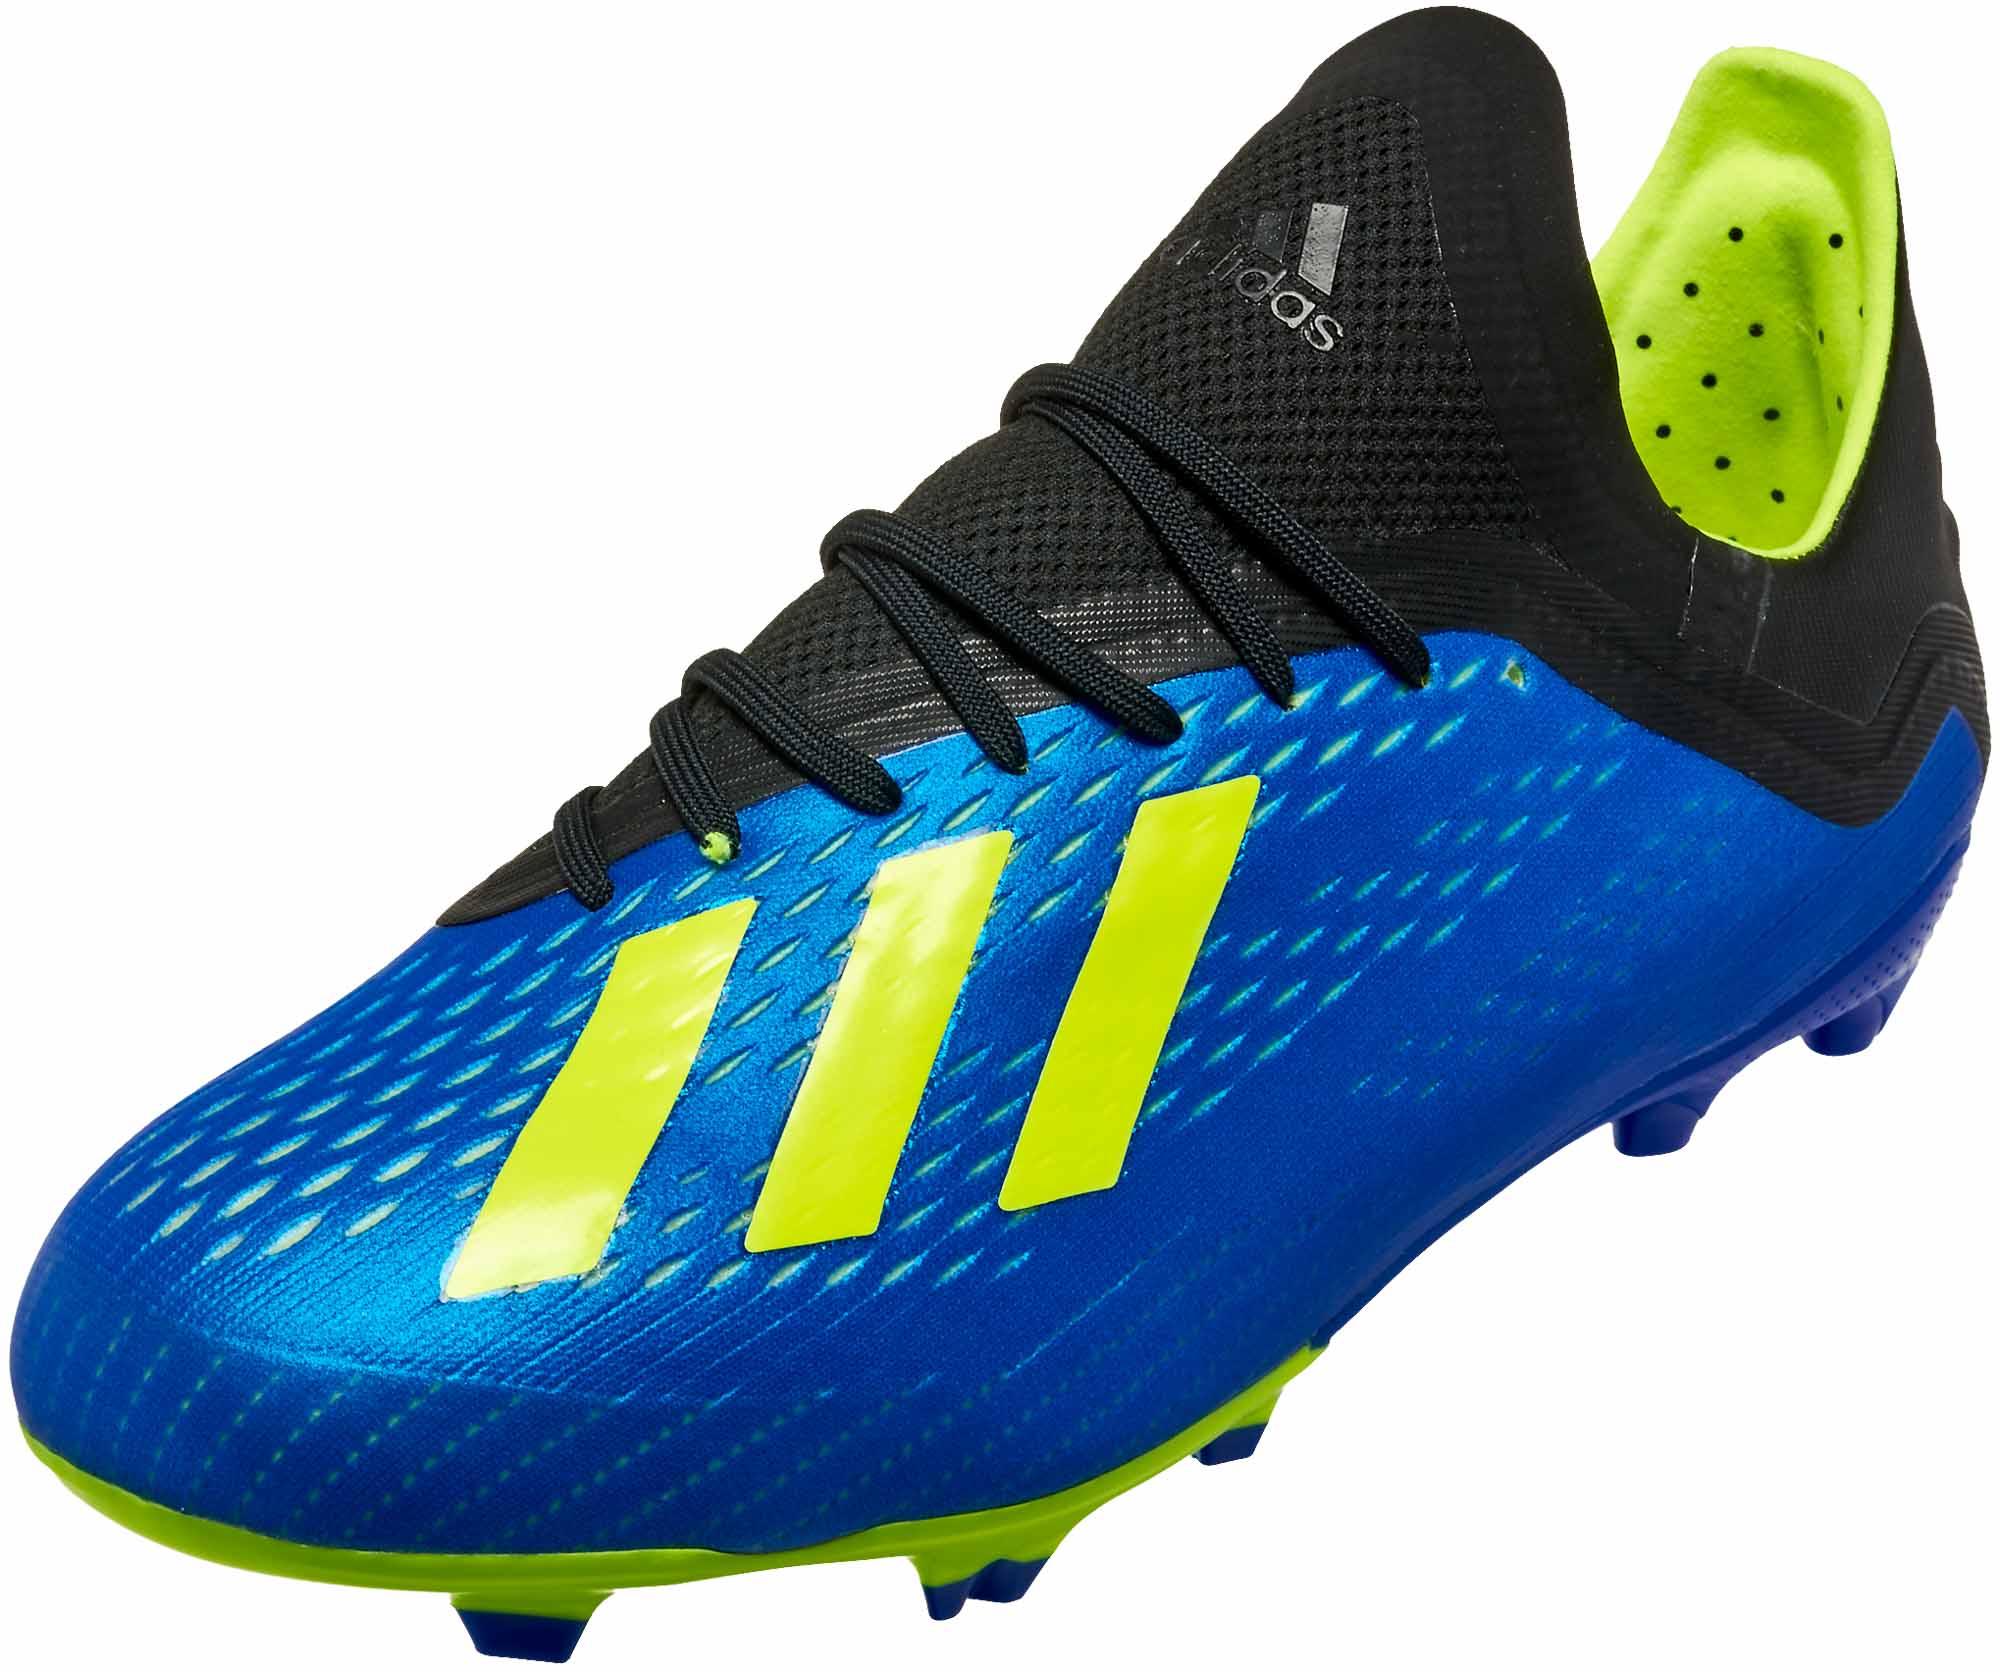 cd409acda Youth adidas X 18.1 FG - Football Blue adidas cleats - SoccerPro.com